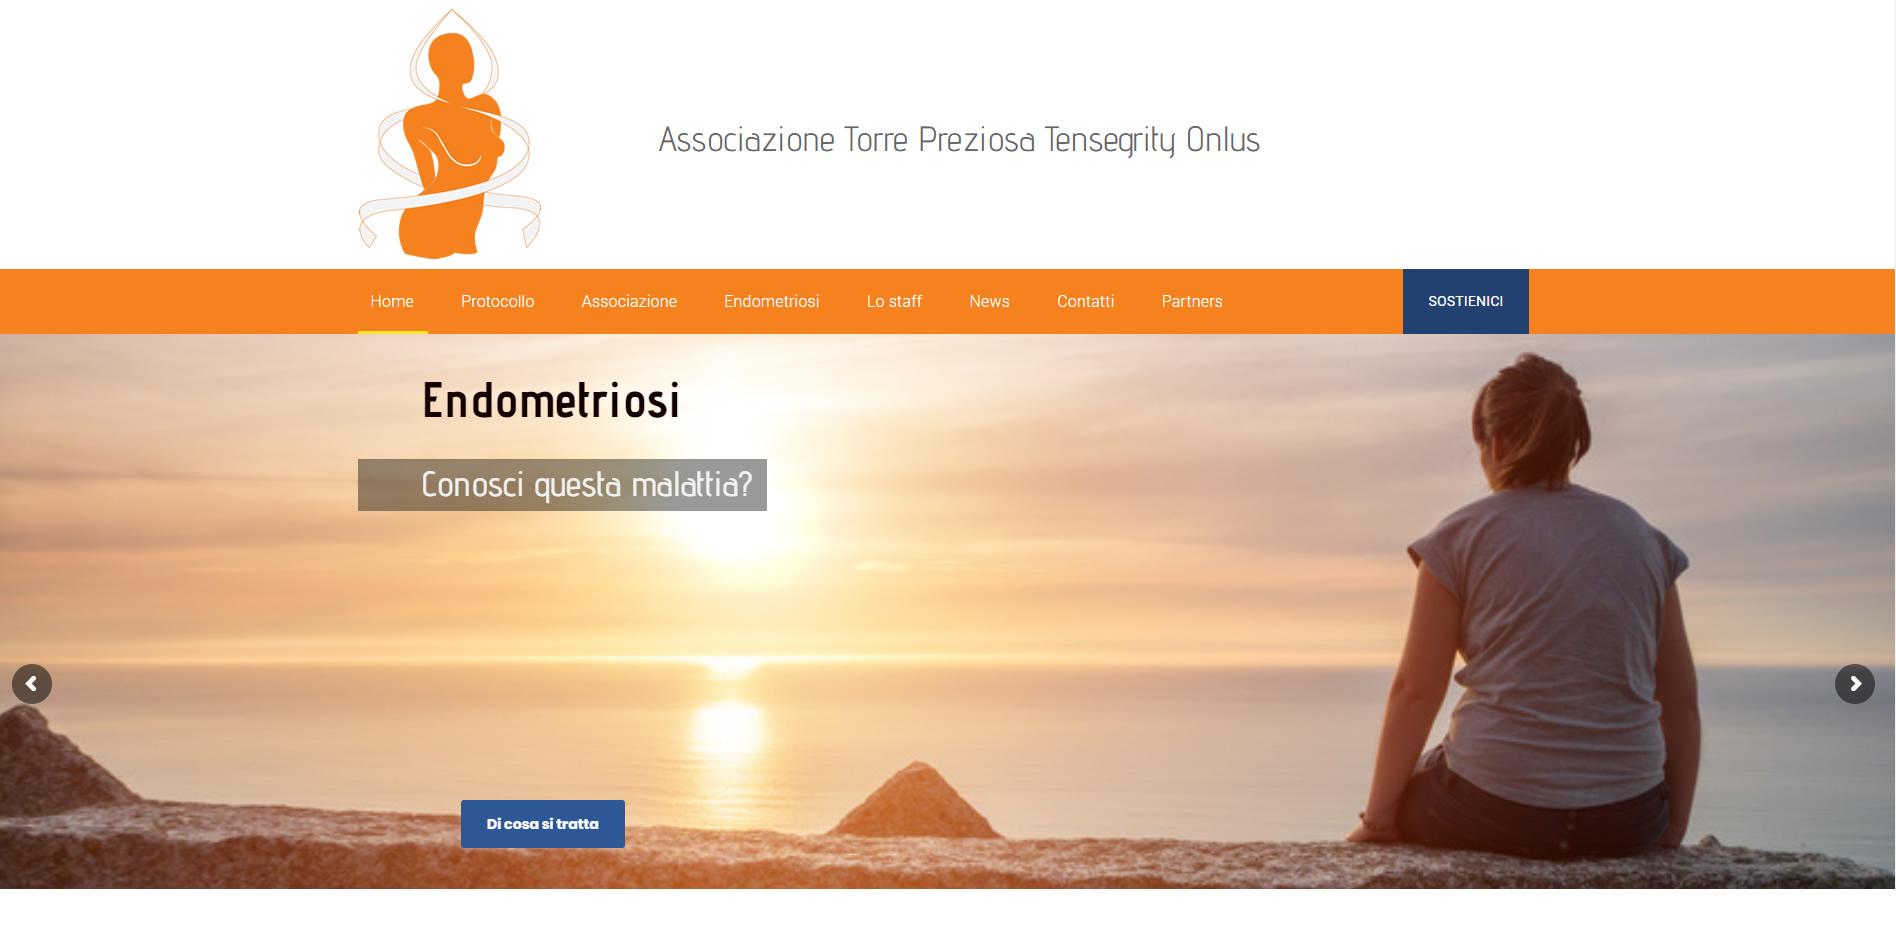 Torre Preziosa Tensegrity ONLUS sito WordPress agenzia web roma